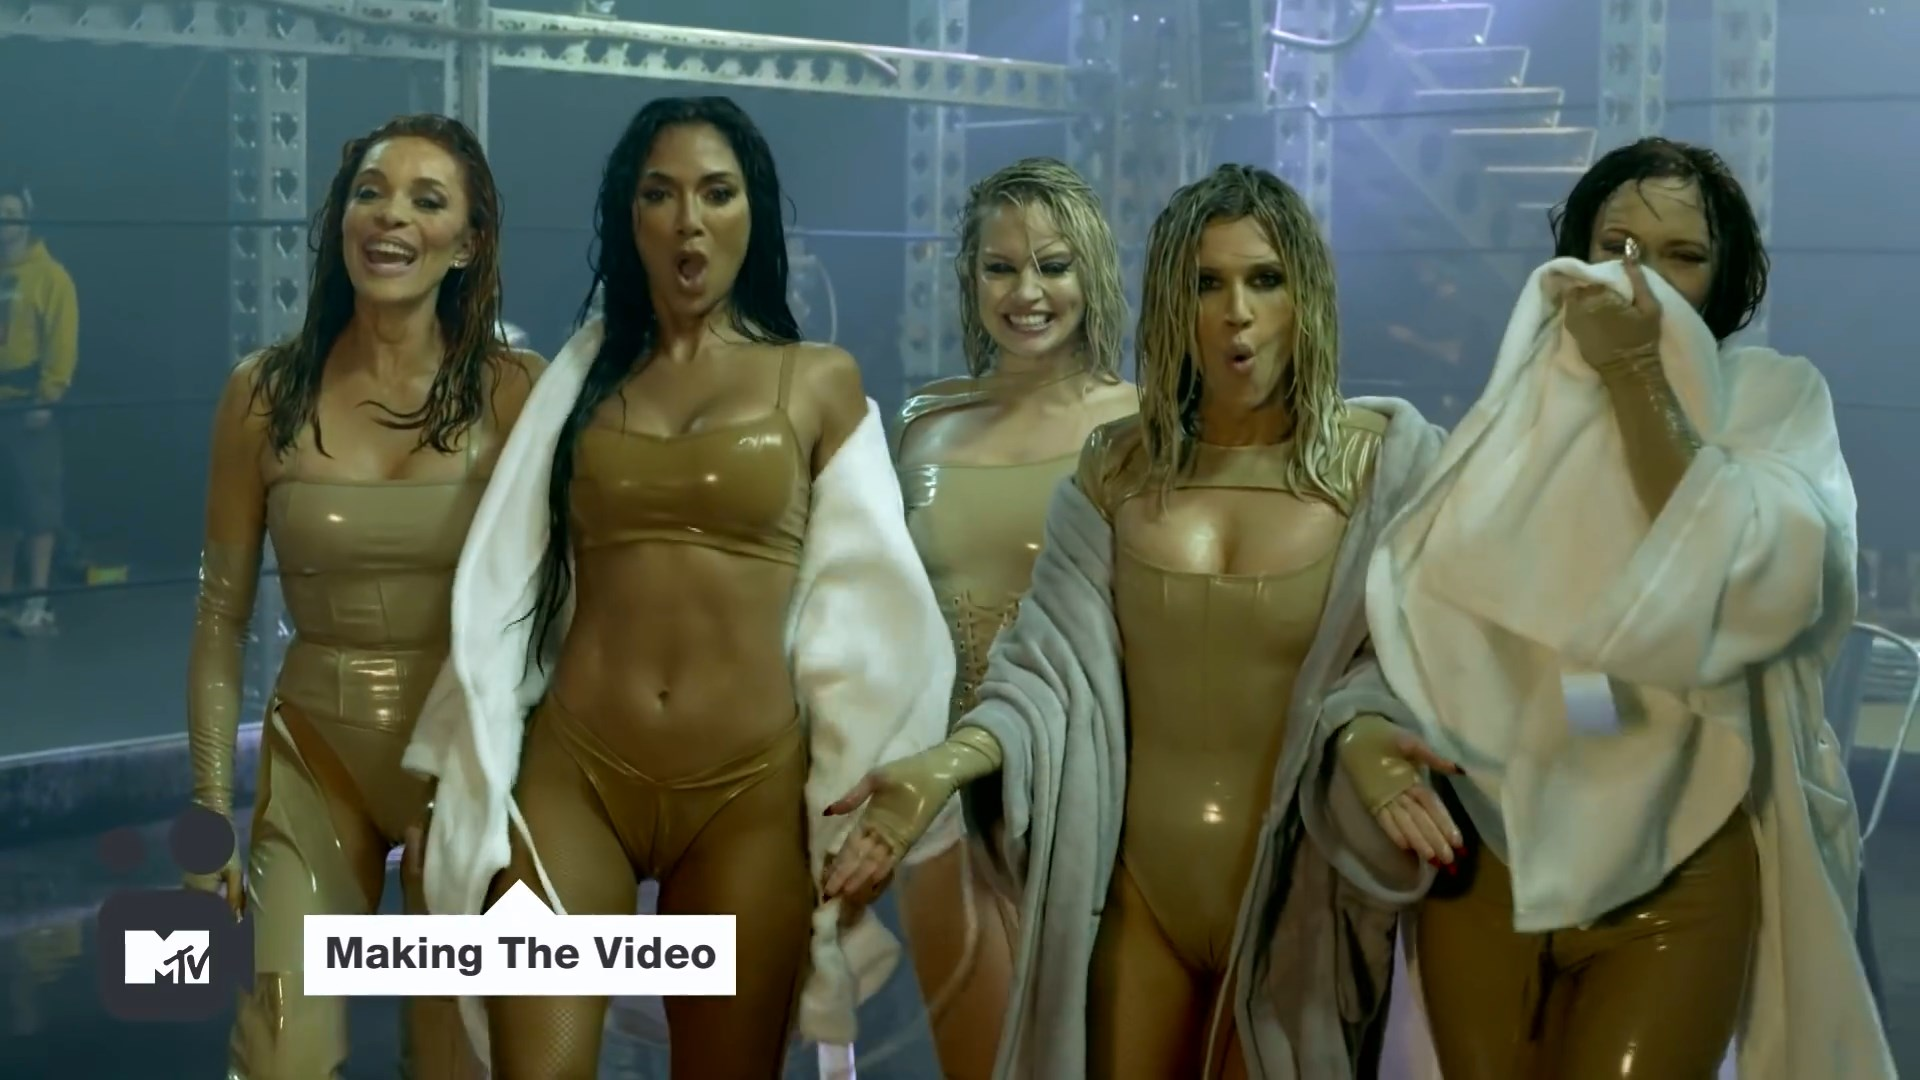 Pussycat Dolls 'React'  Making The Video ¦ MTV Music.mp4_snapshot_03.26_[2020.02.10_04.51.29].jpg